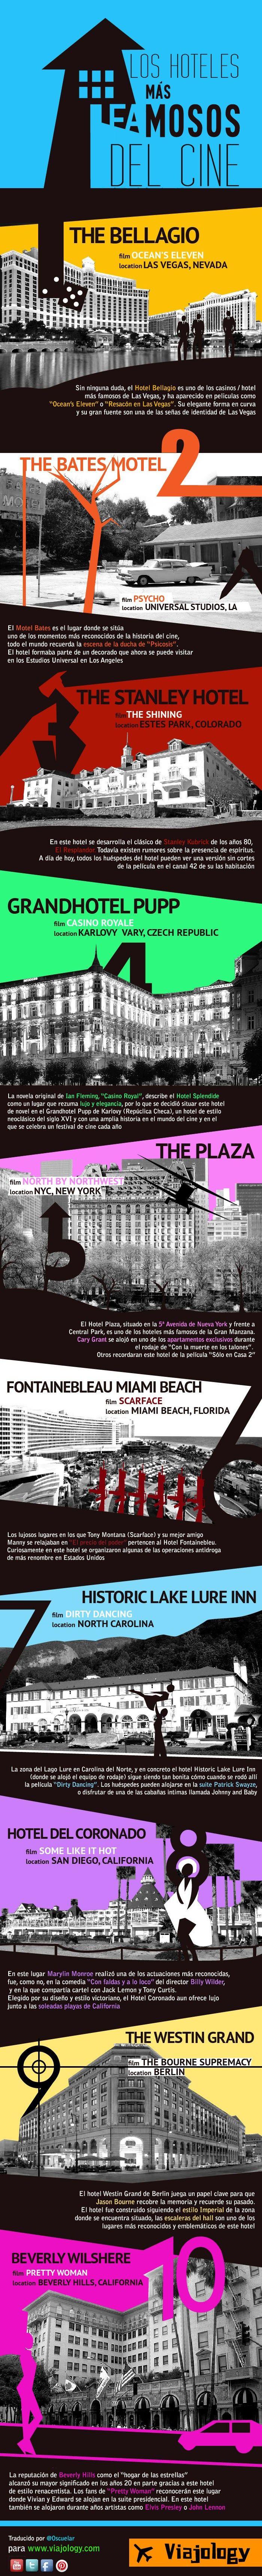 Los hoteles más famosos del cine #infografia #infographic #tourism